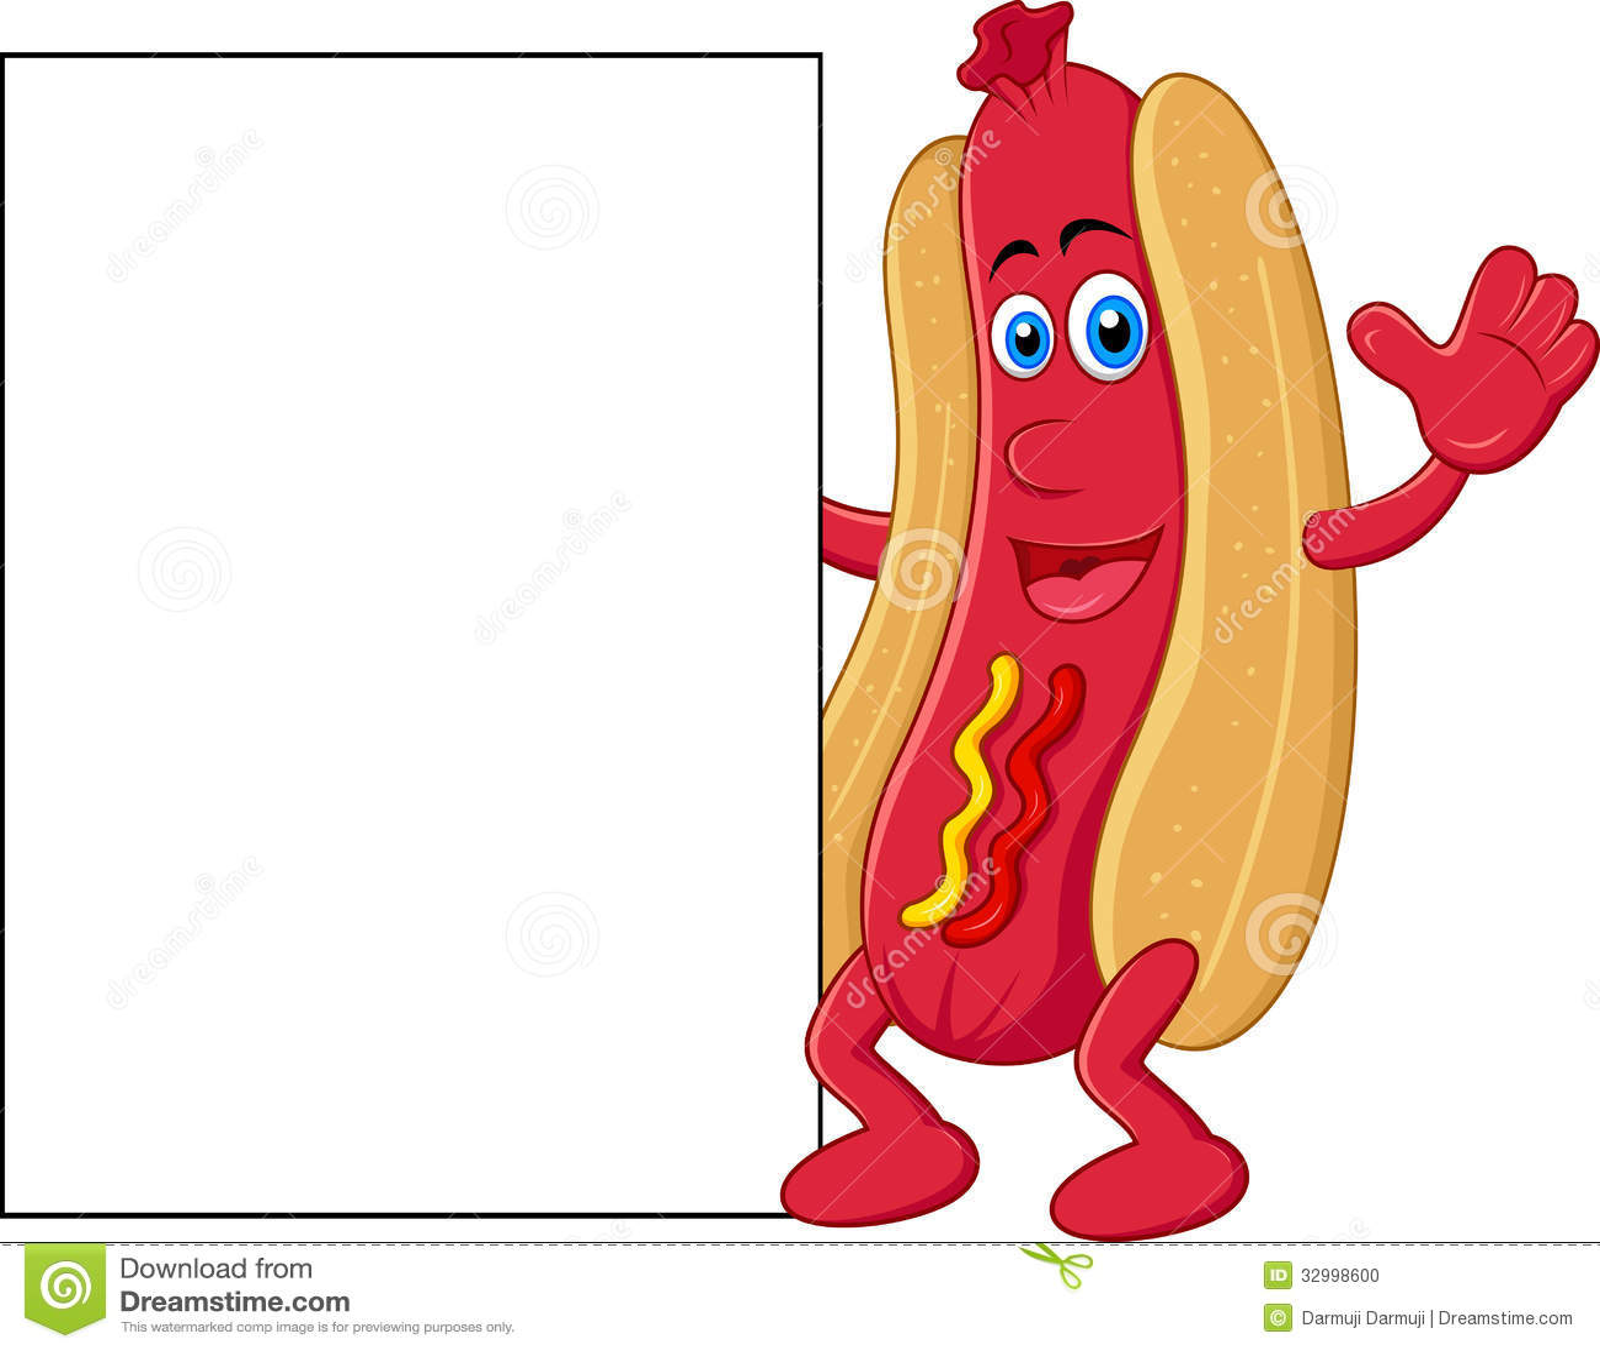 free chili dog clipart - photo #44